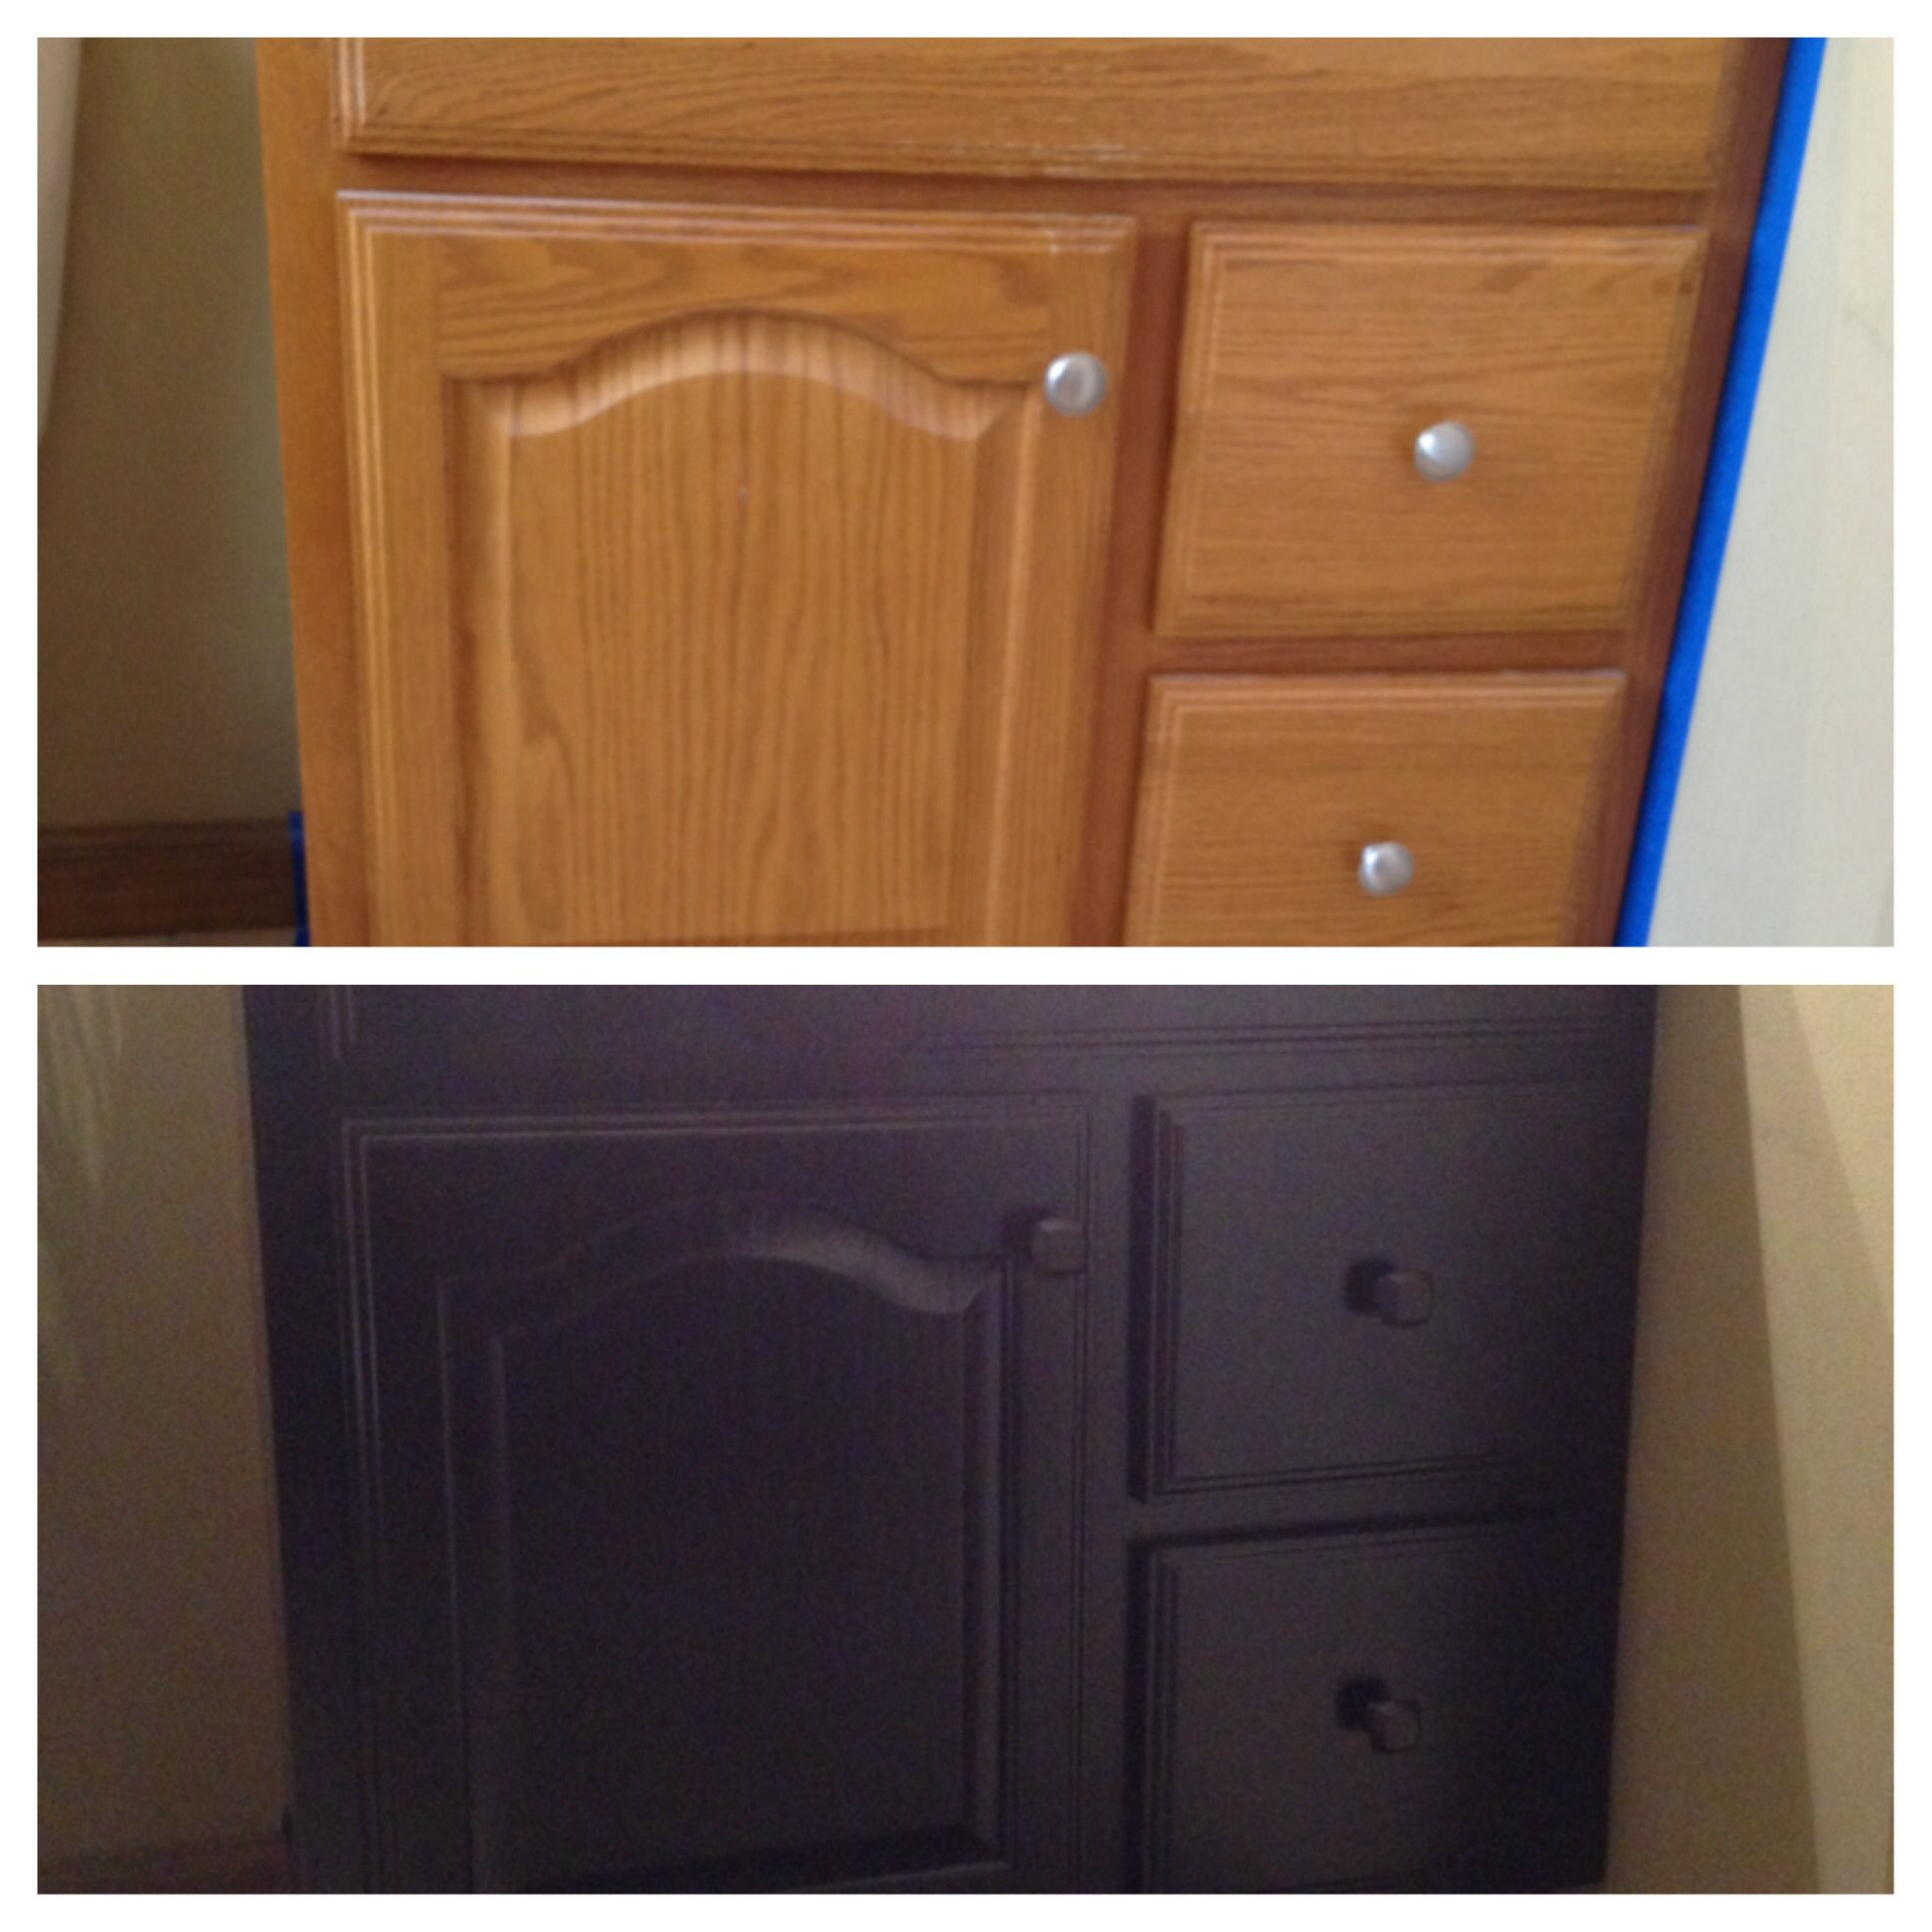 diy reface bathroom vanity 1quart of black satin paint 8 didn 39 t even use half of it 3 new. Black Bedroom Furniture Sets. Home Design Ideas